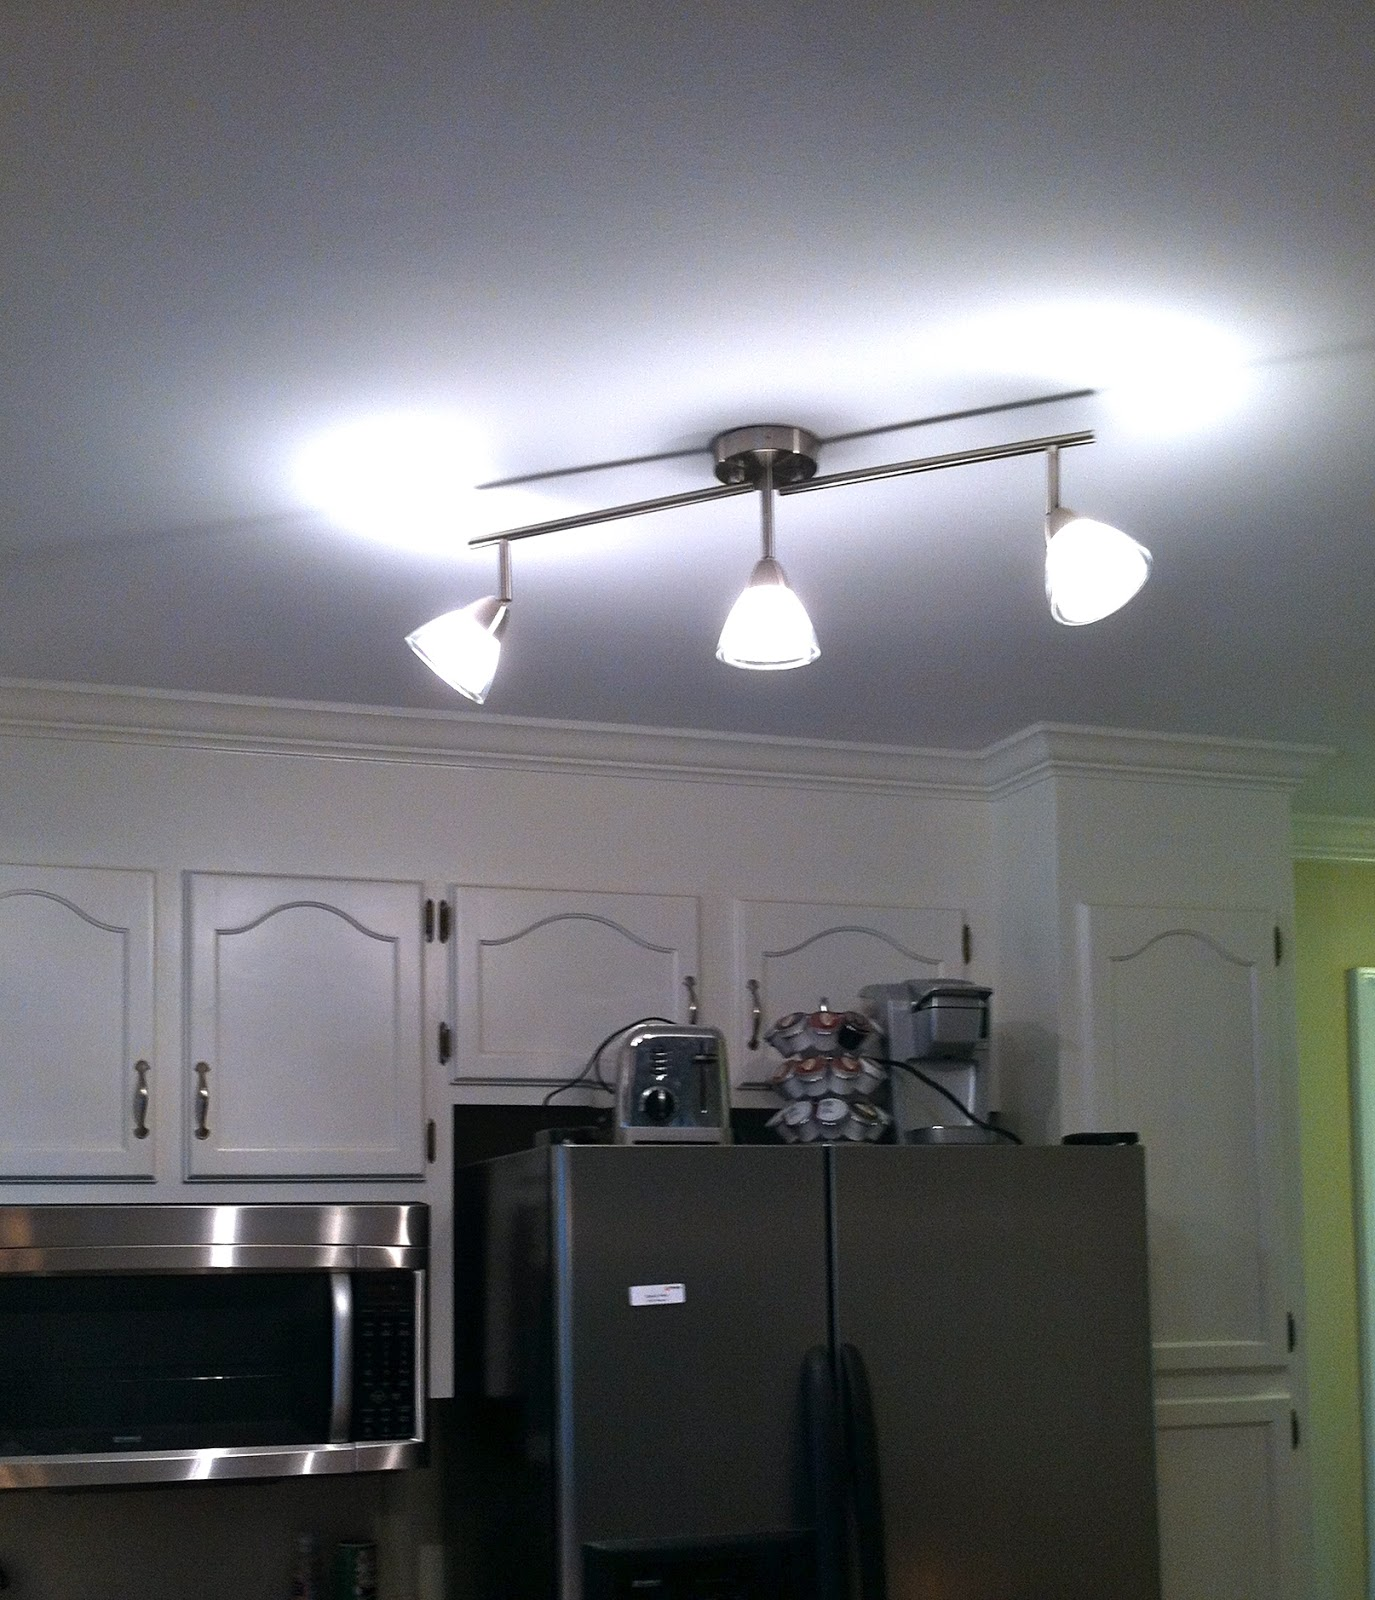 Lighting Fixtures For Kitchens: Lowes Lighting Fixtures Kitchens